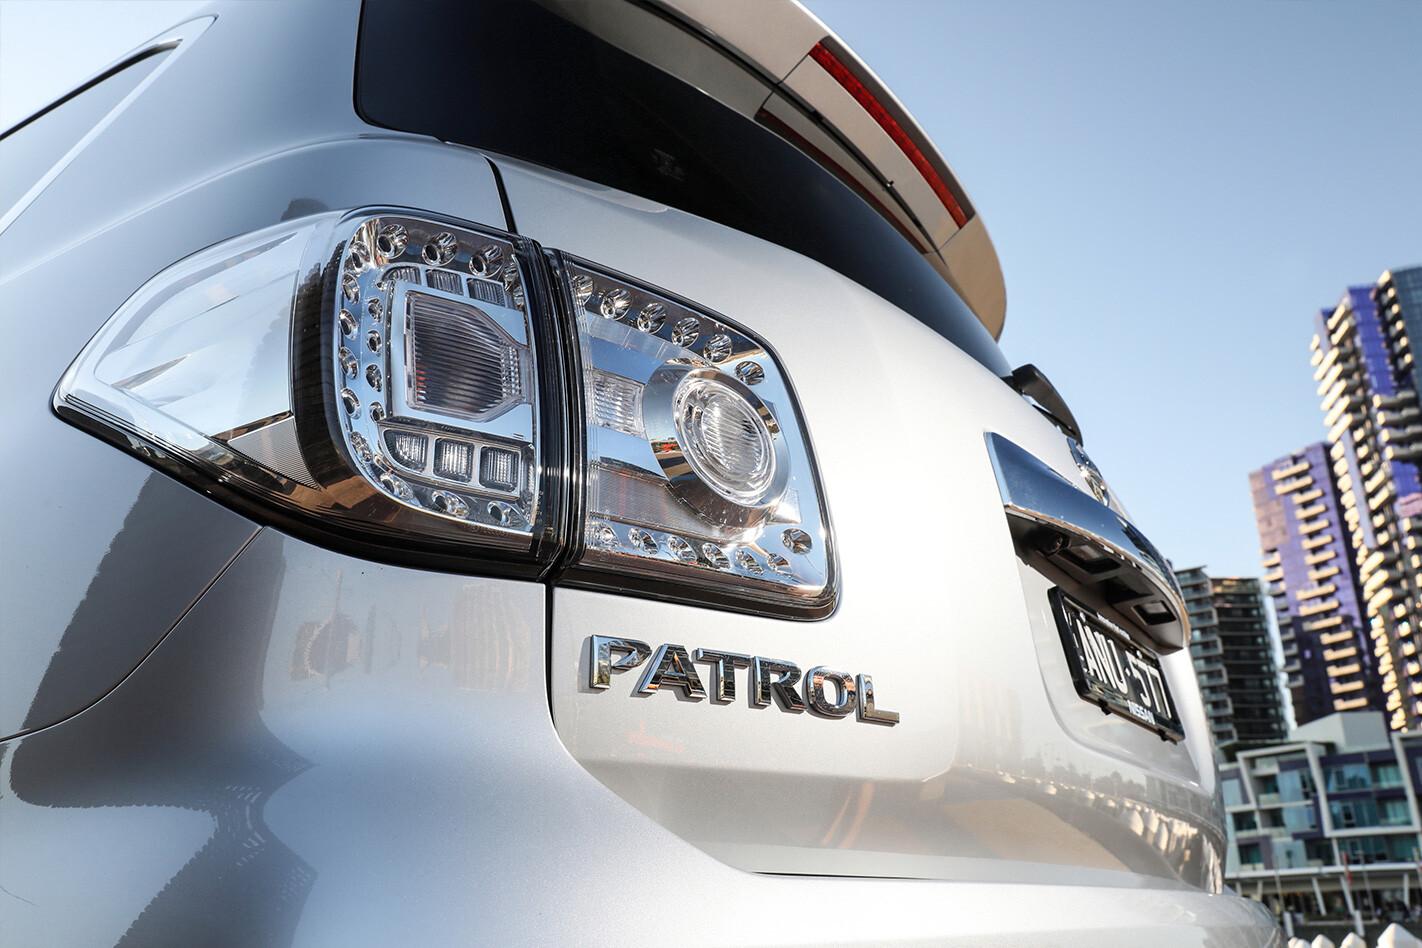 2018 Nissan Patrol Review